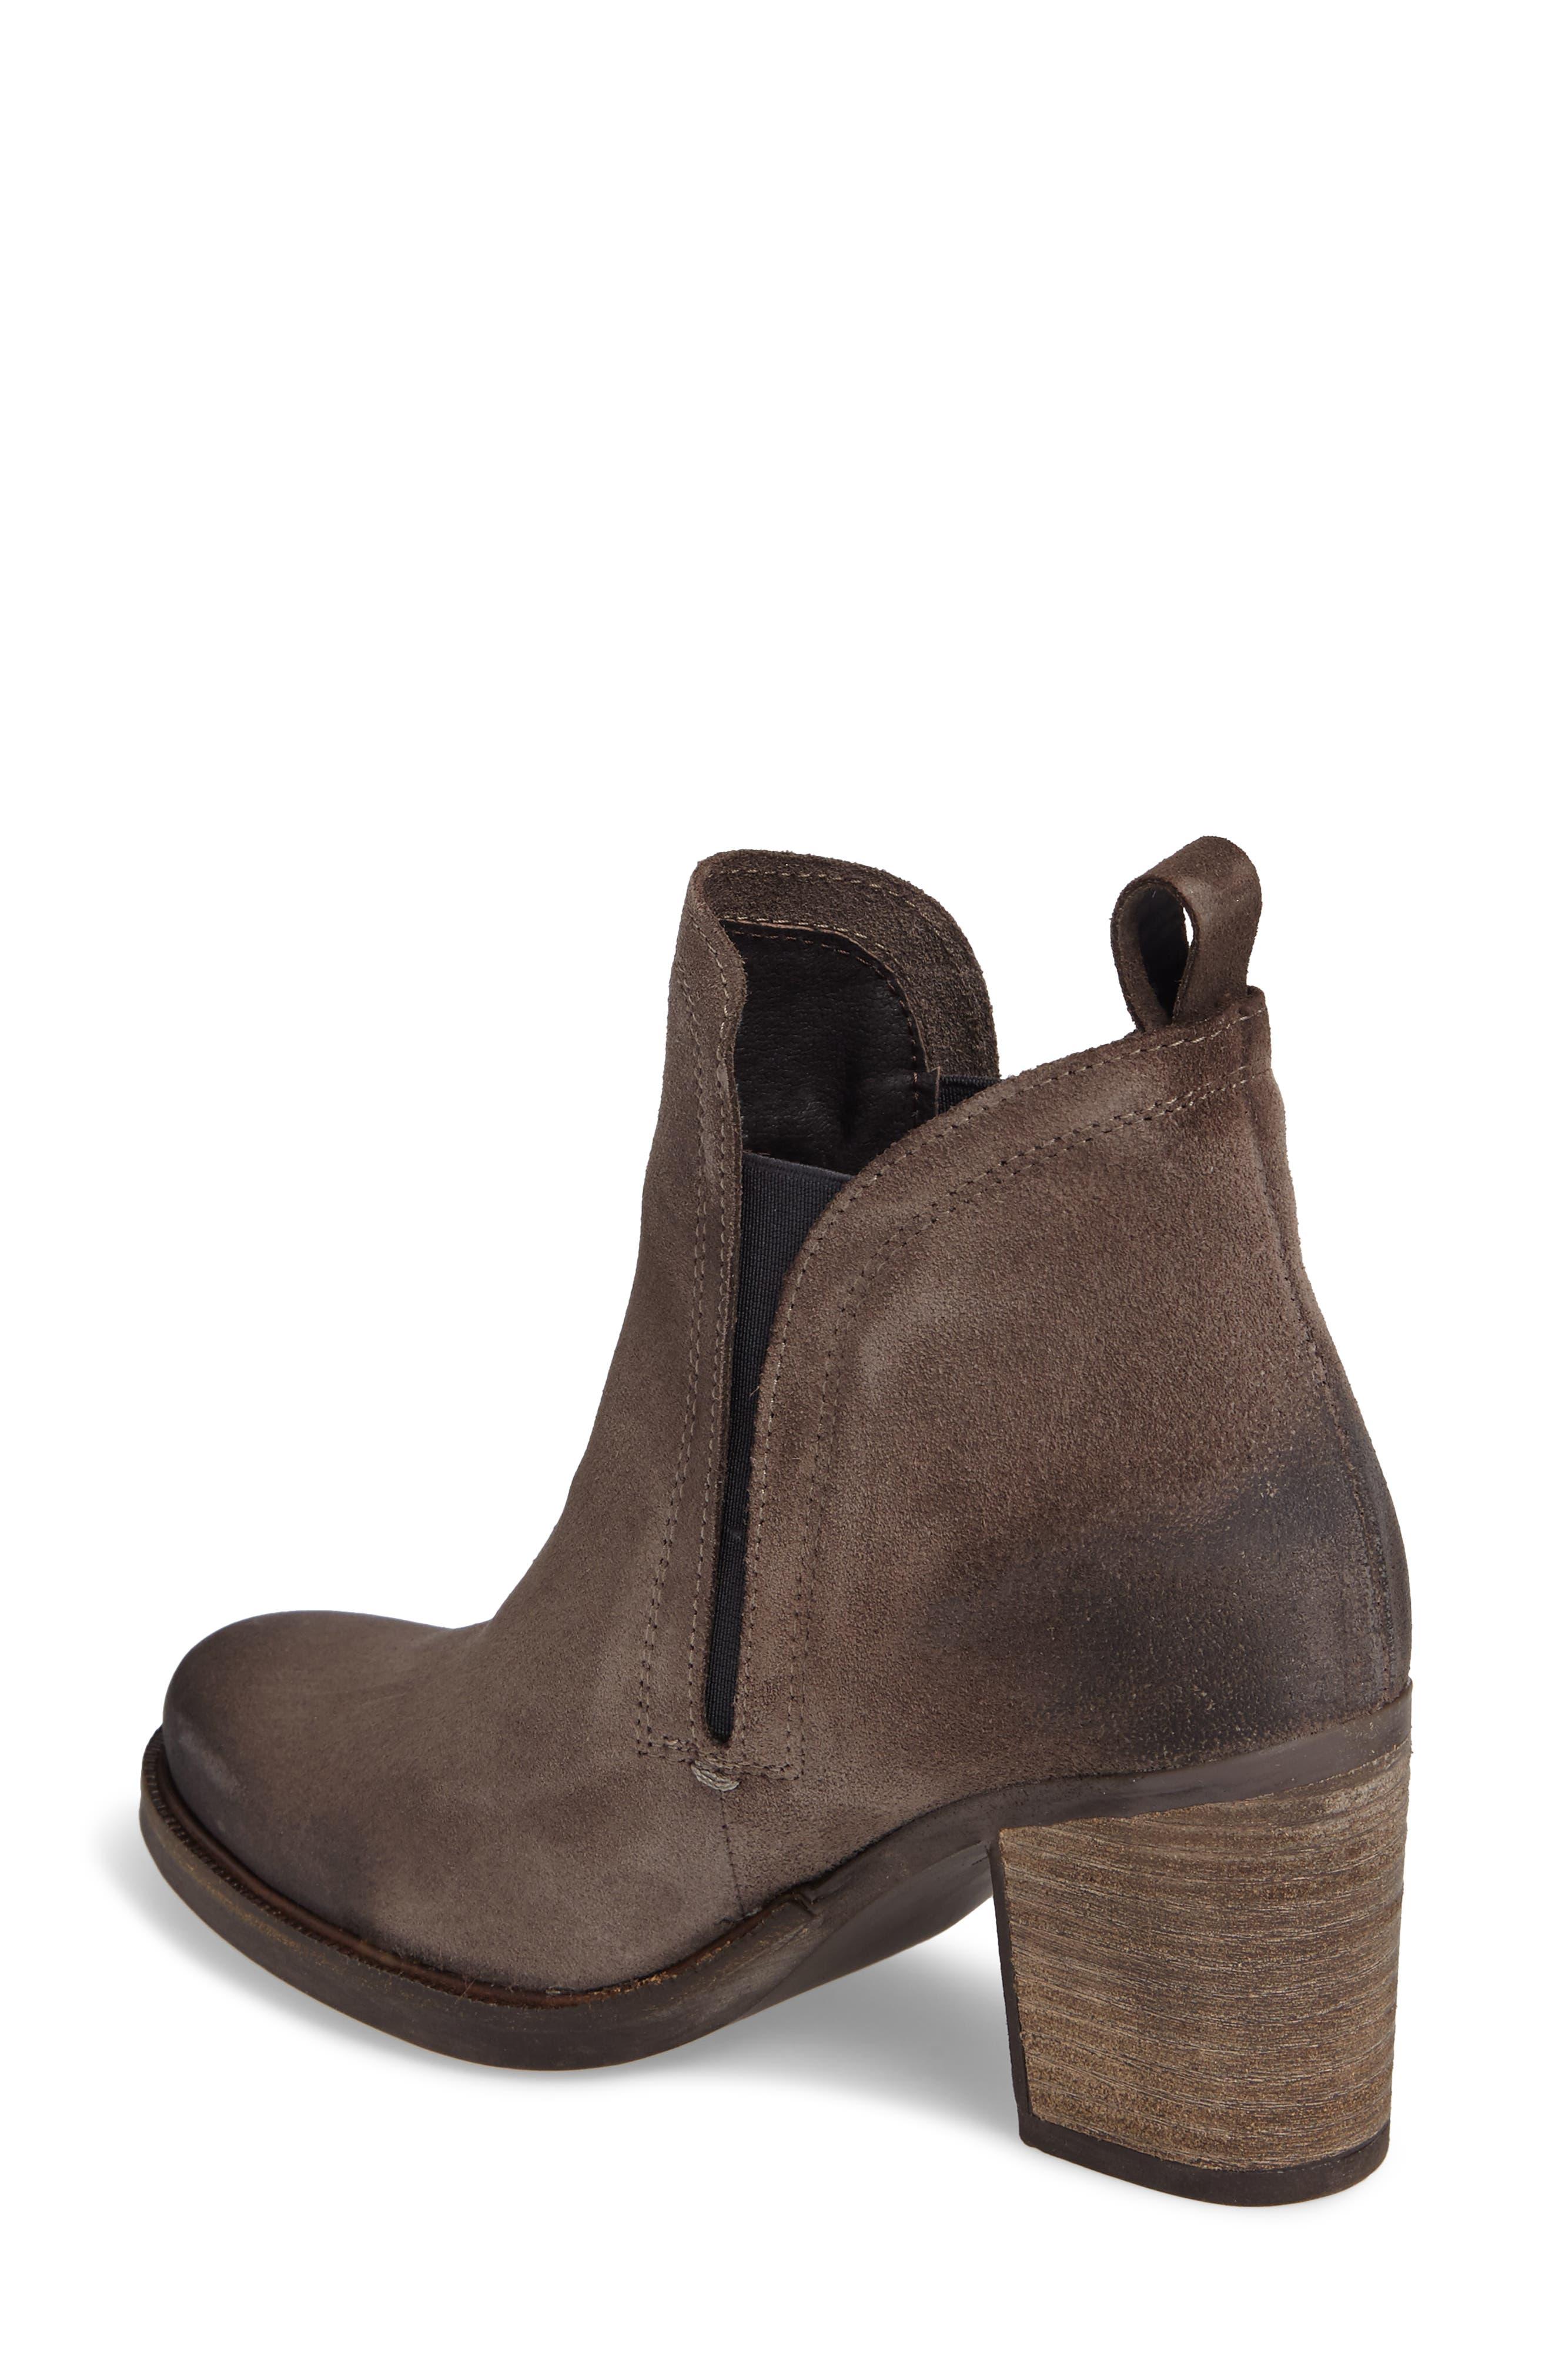 'Belfield' Waterproof Chelsea Boot,                             Alternate thumbnail 2, color,                             Grey Suede